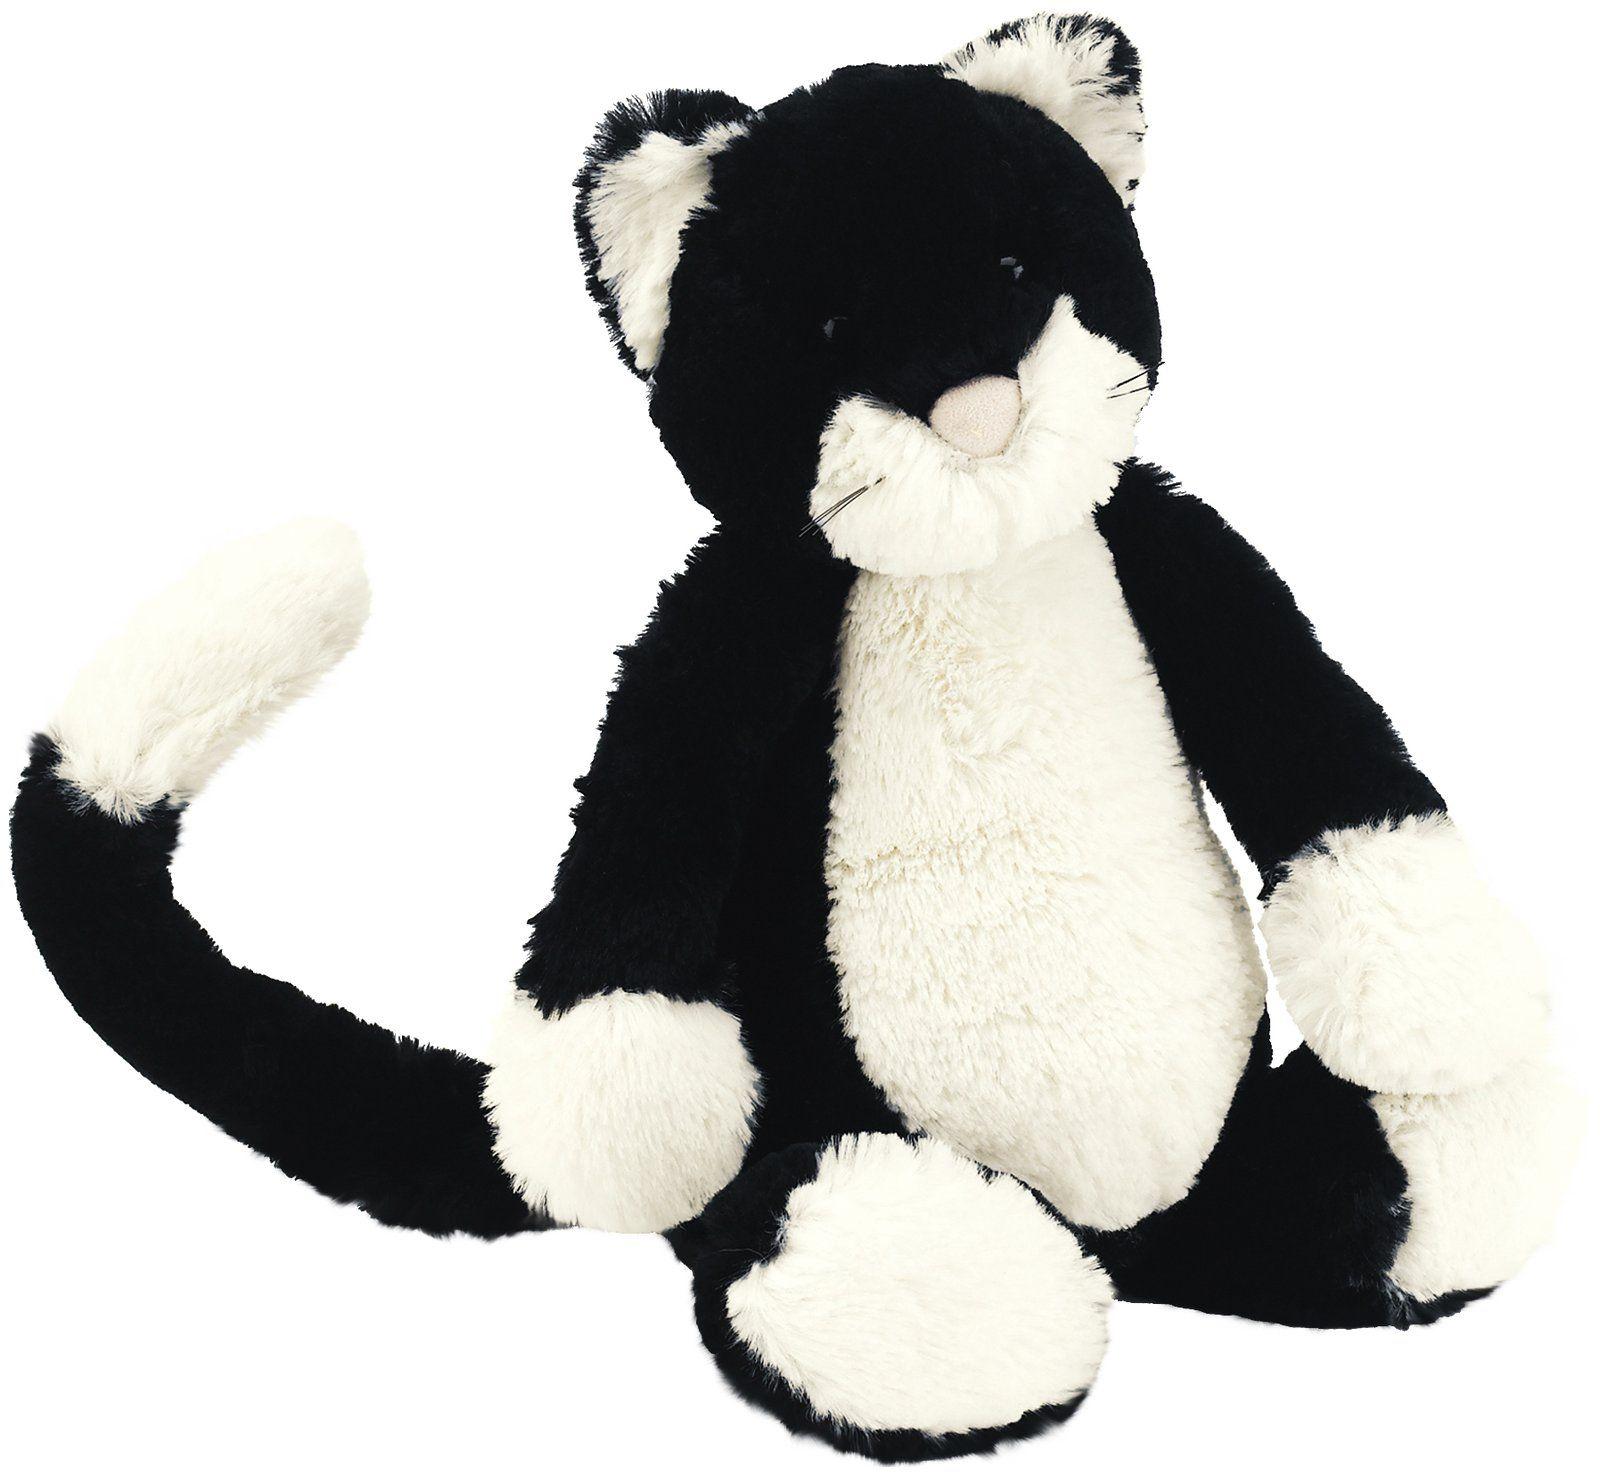 Jellycat Bashful Black And White Kitten Medium Free Shipping Jellycat Stuffed Animals Black And White Kittens Baby Toys Newborn